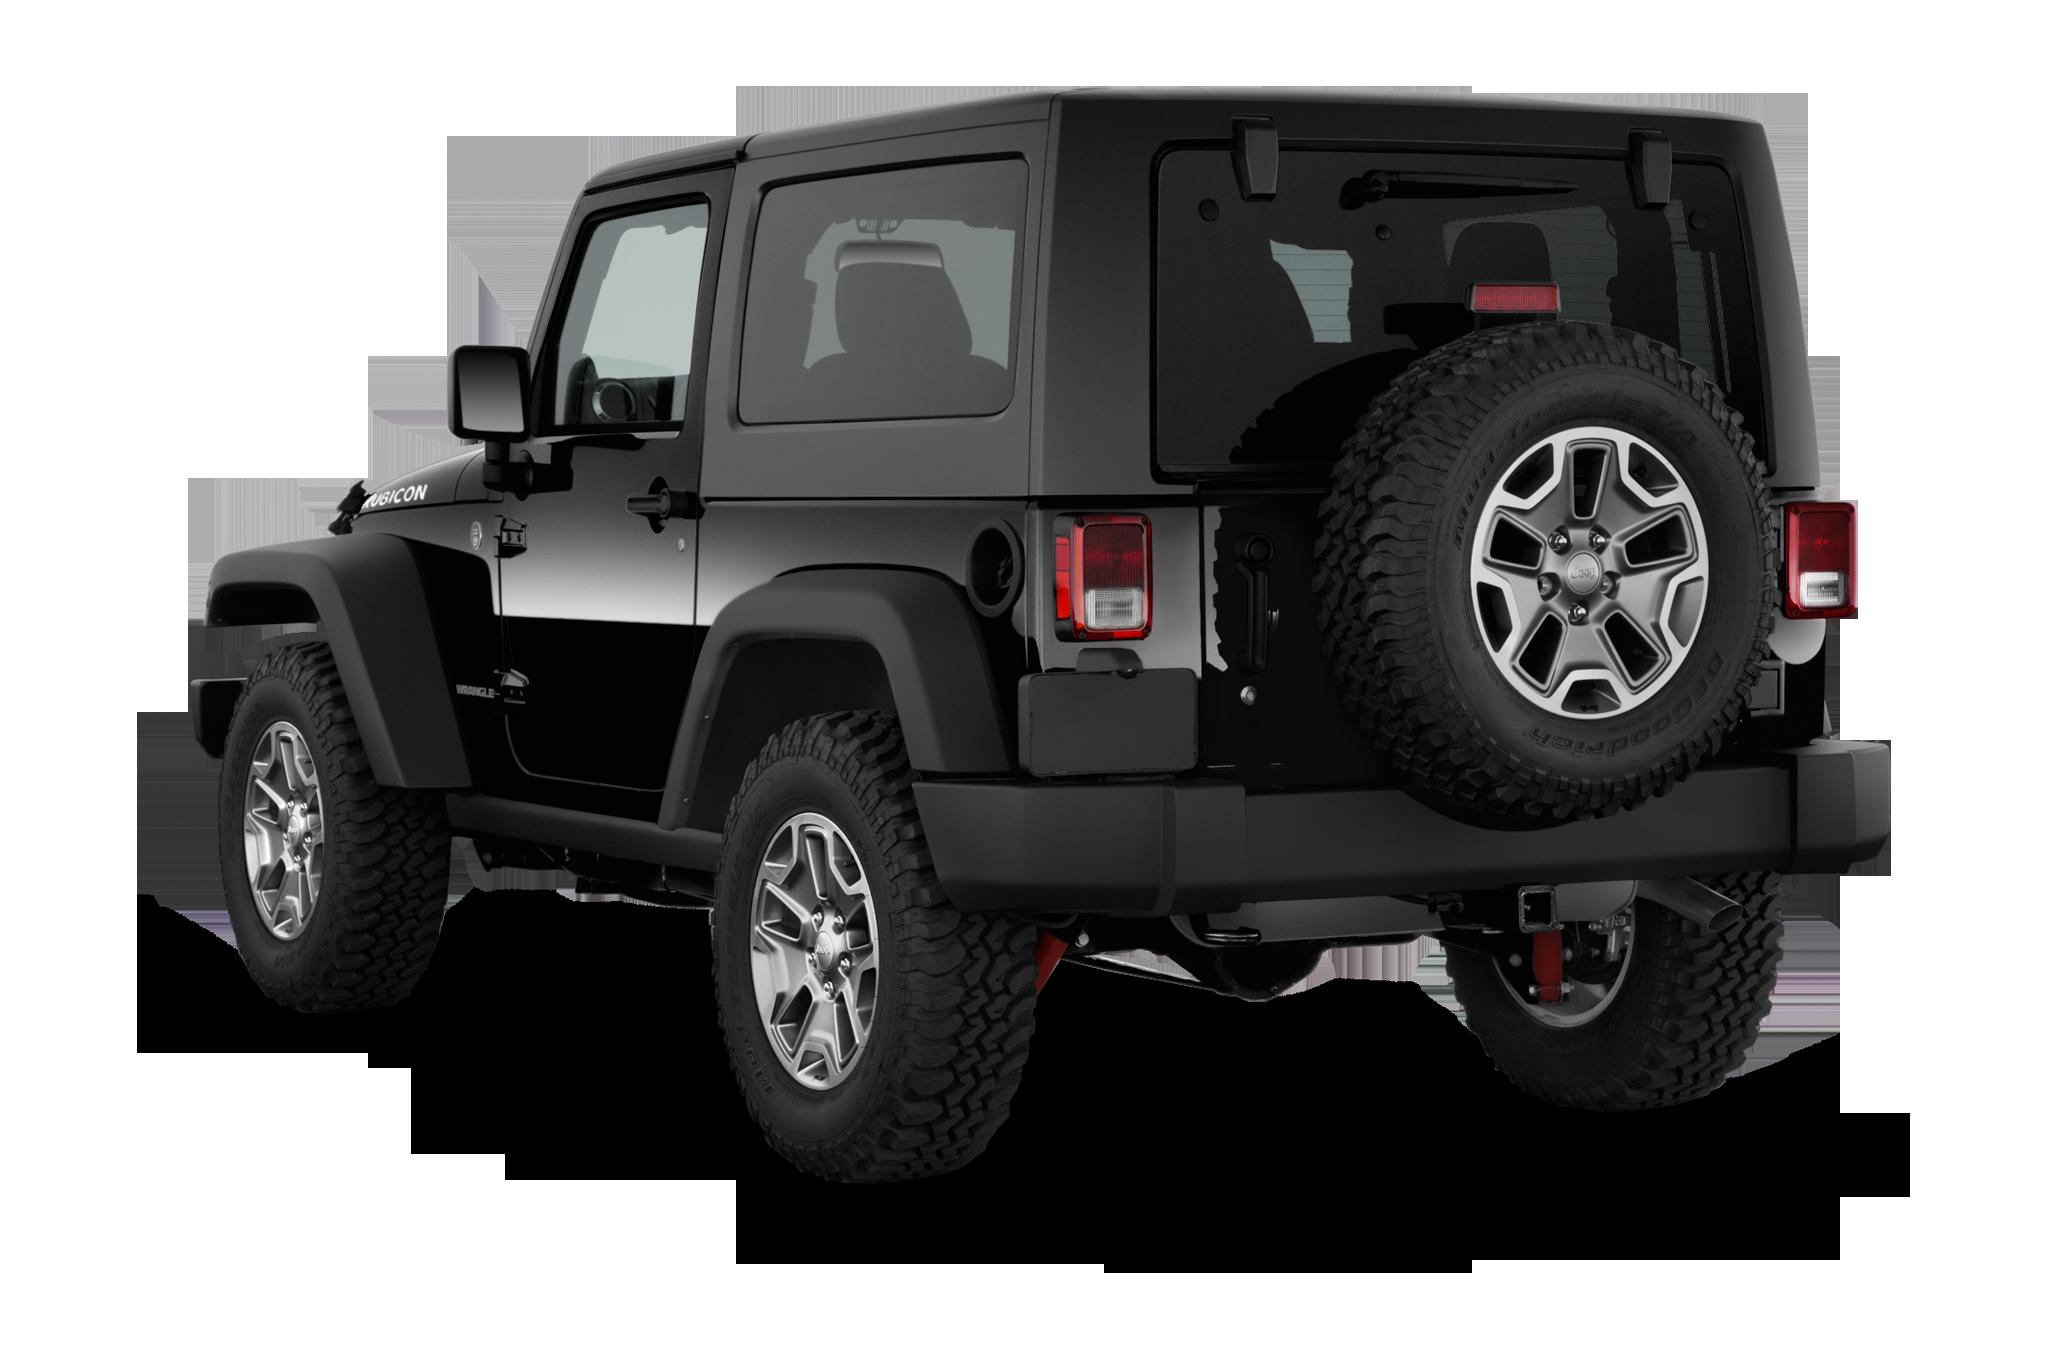 Wrangler Rubicon 4 Door >> 2018 Jeep Wrangler Prototype Spied with Body, Suspension Modifications